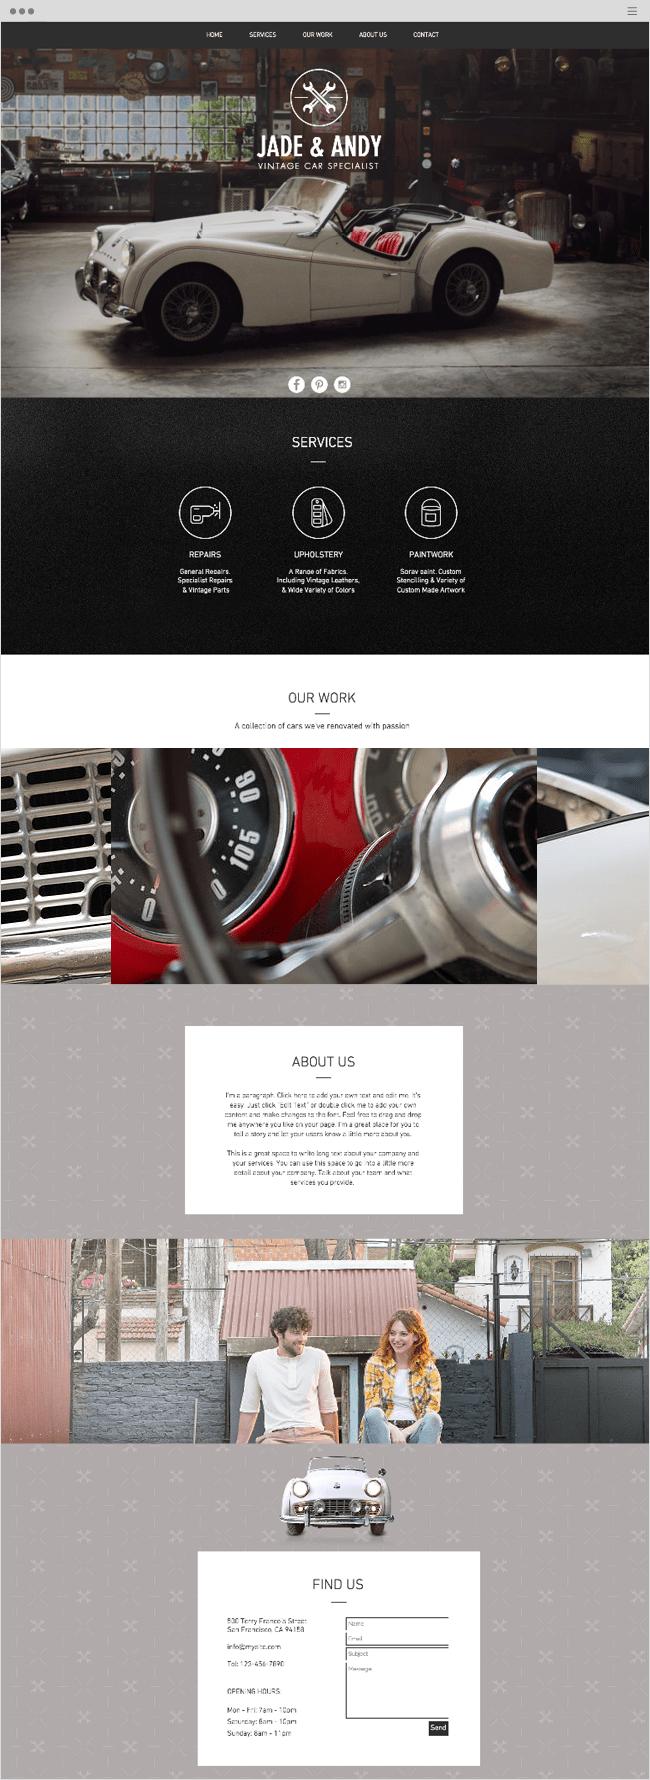 new templates_jan 201614